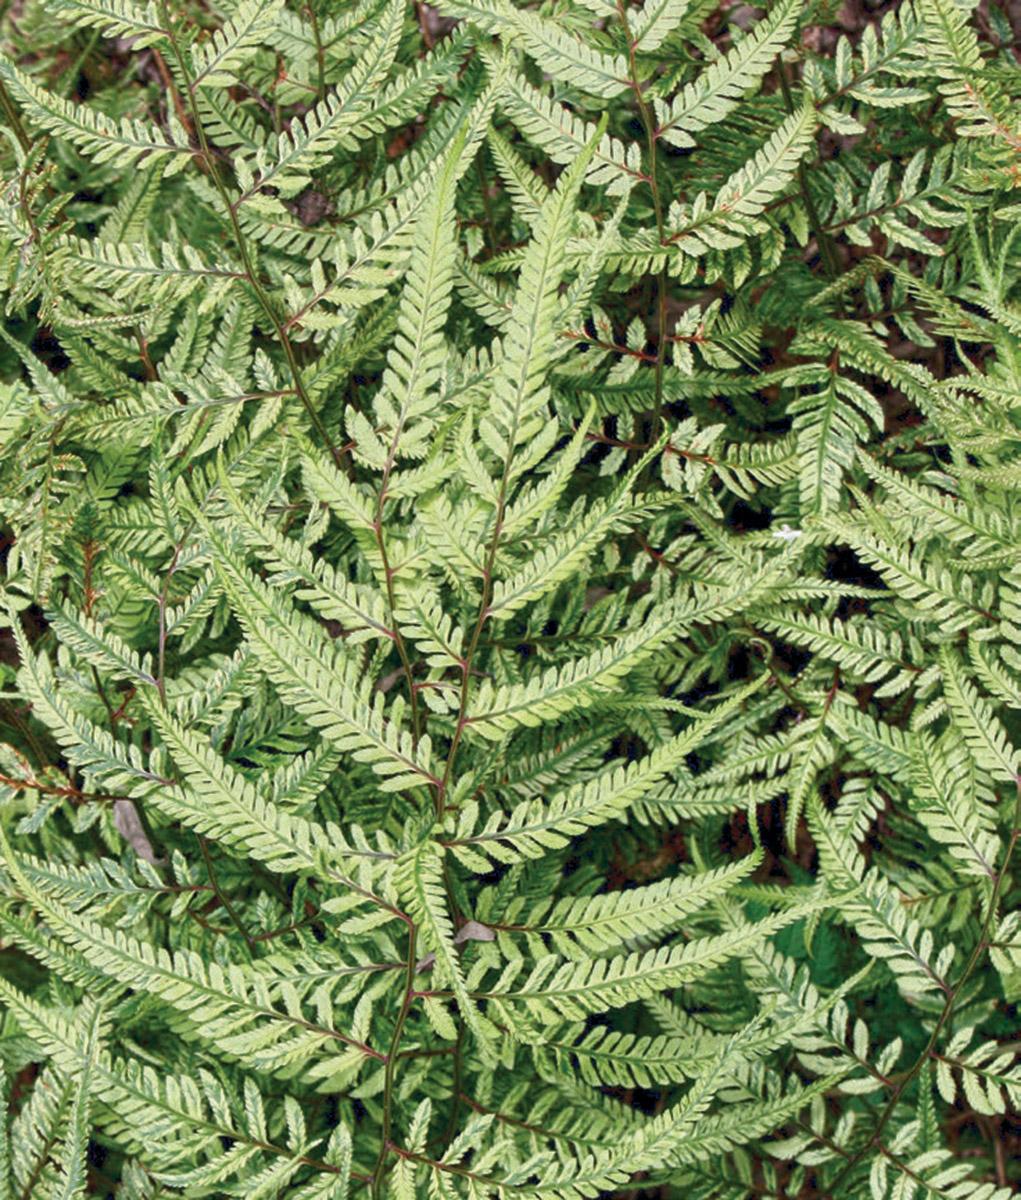 Lemon Cream painted fern